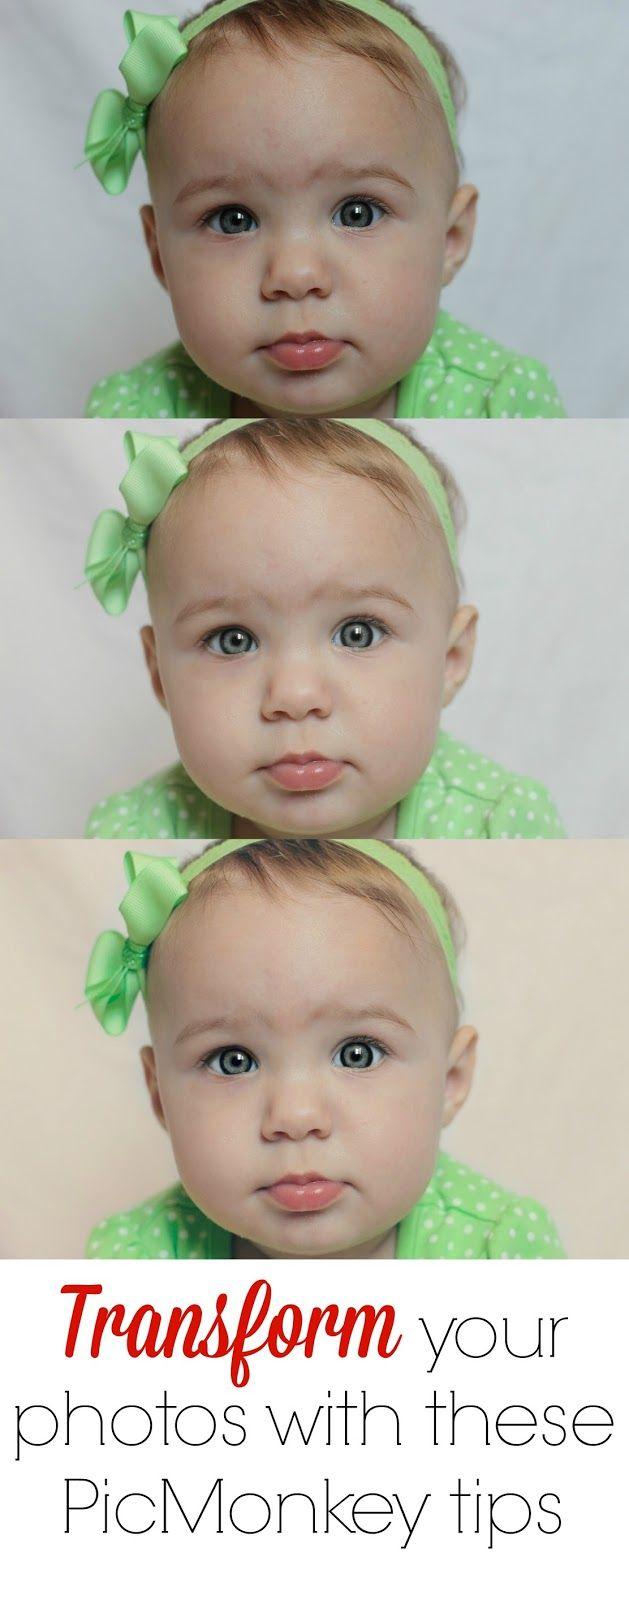 Just a Touch of Crazy: Transform your photos with these PicMonkey tips #wakeupwednesdays #apeekintomyparadise